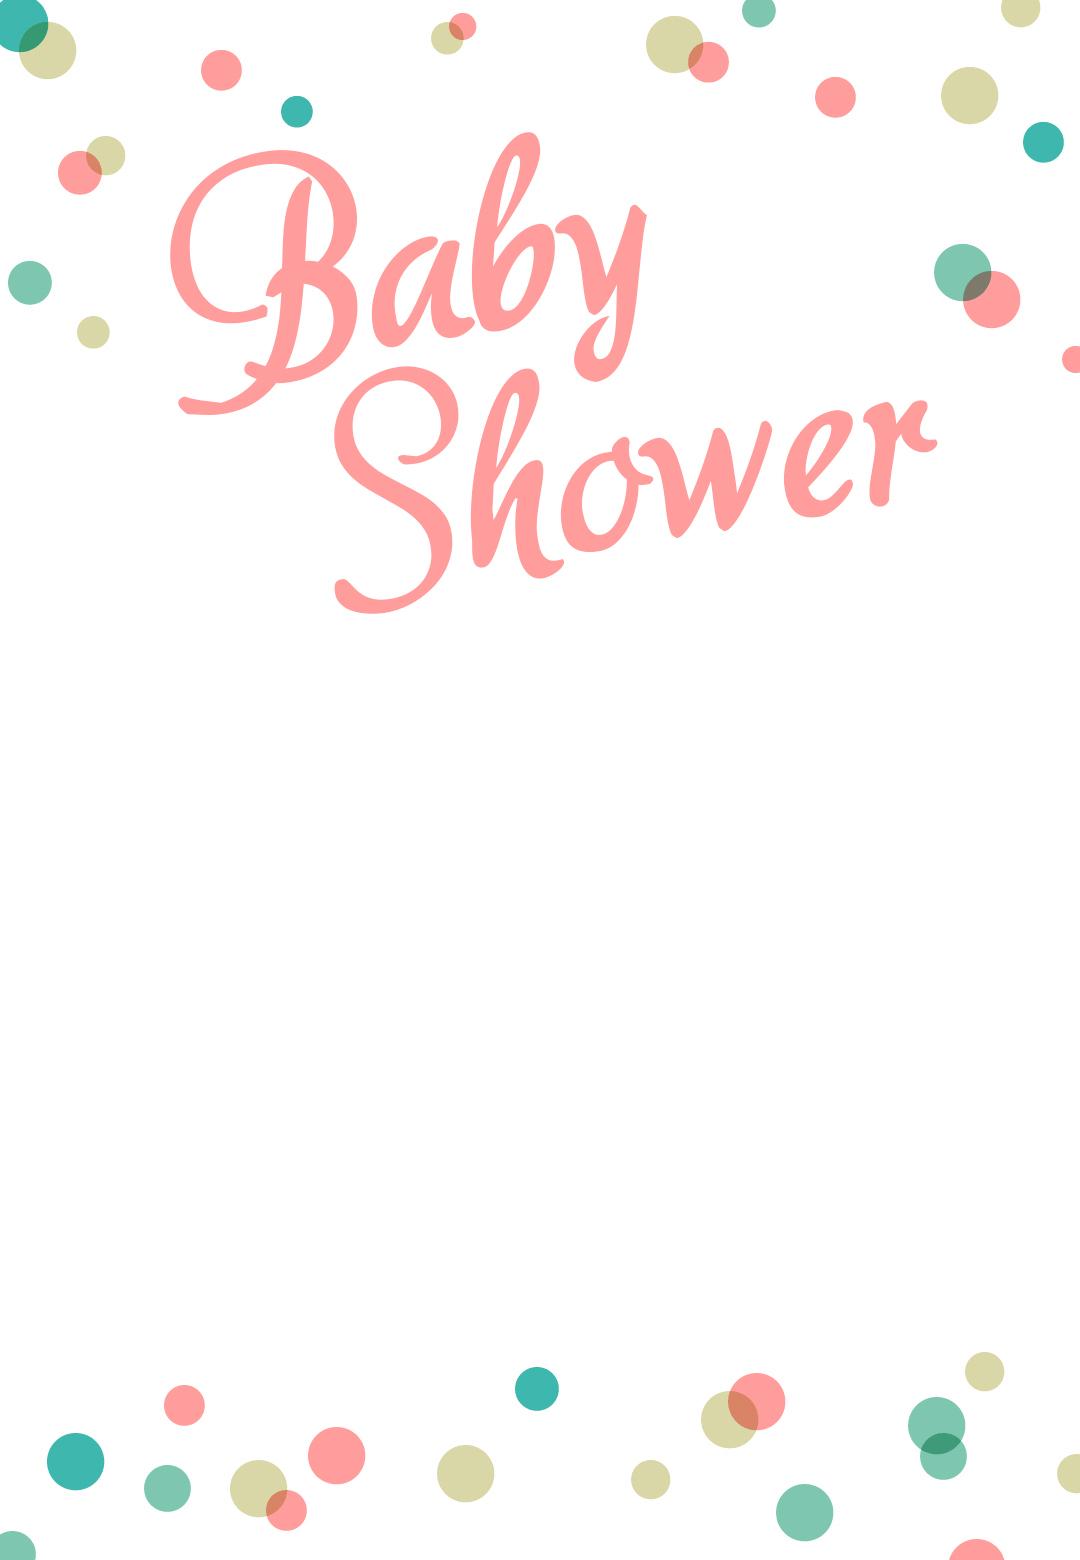 Dancing Dots Borders - Free Printable Baby Shower Invitation - Free Printable Baby Sprinkle Invitations